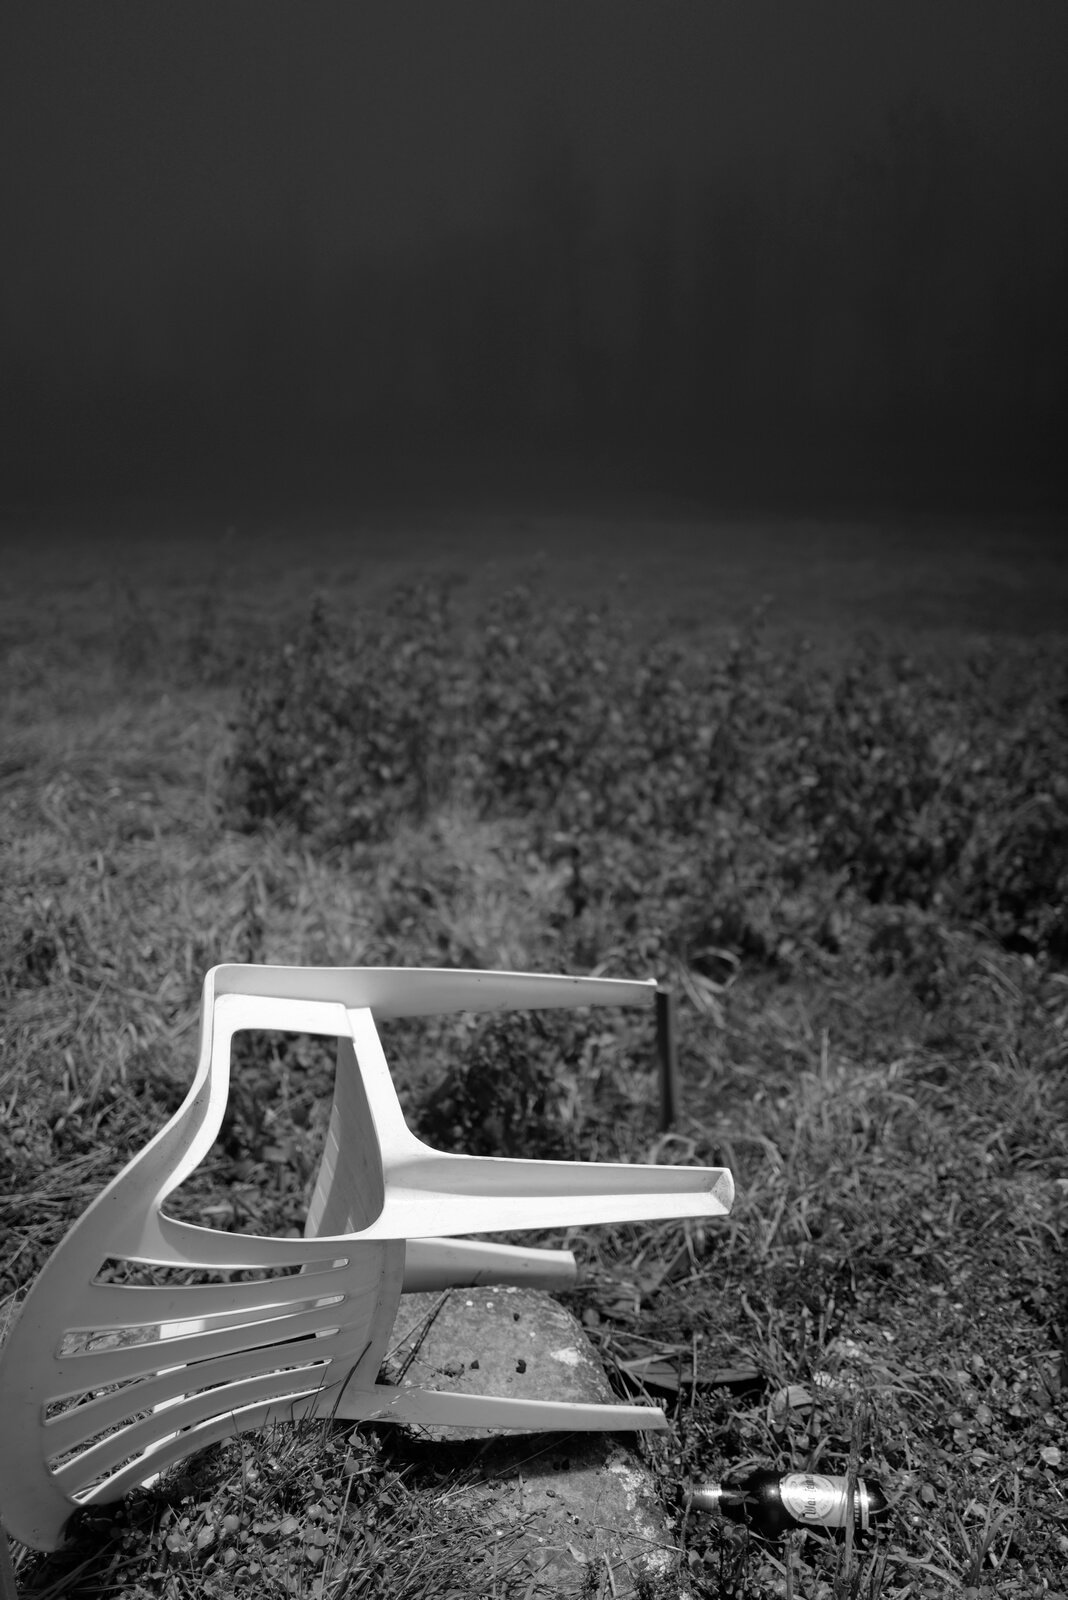 20_The-Absence_Attilio-Solzi